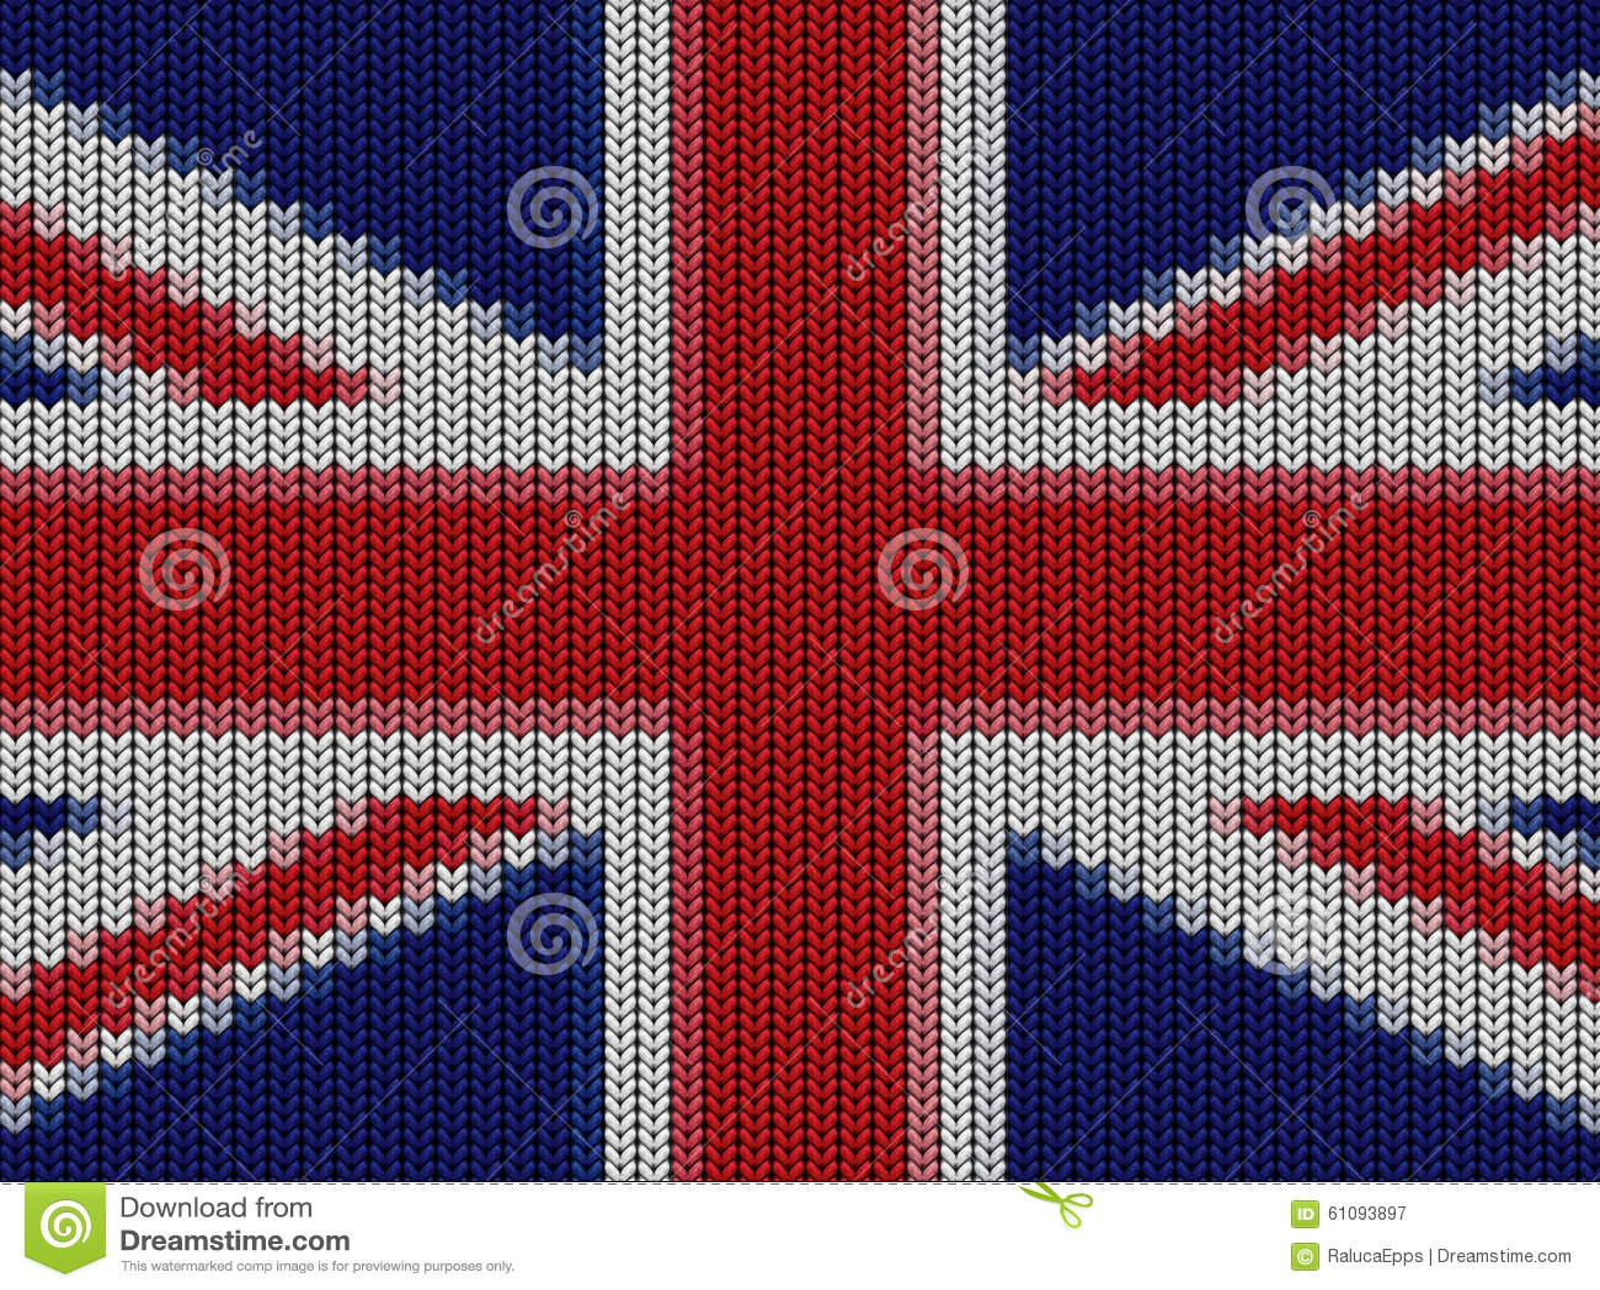 UK English Flag In Knitting Pattern Stock Illustration - Image: 61093897